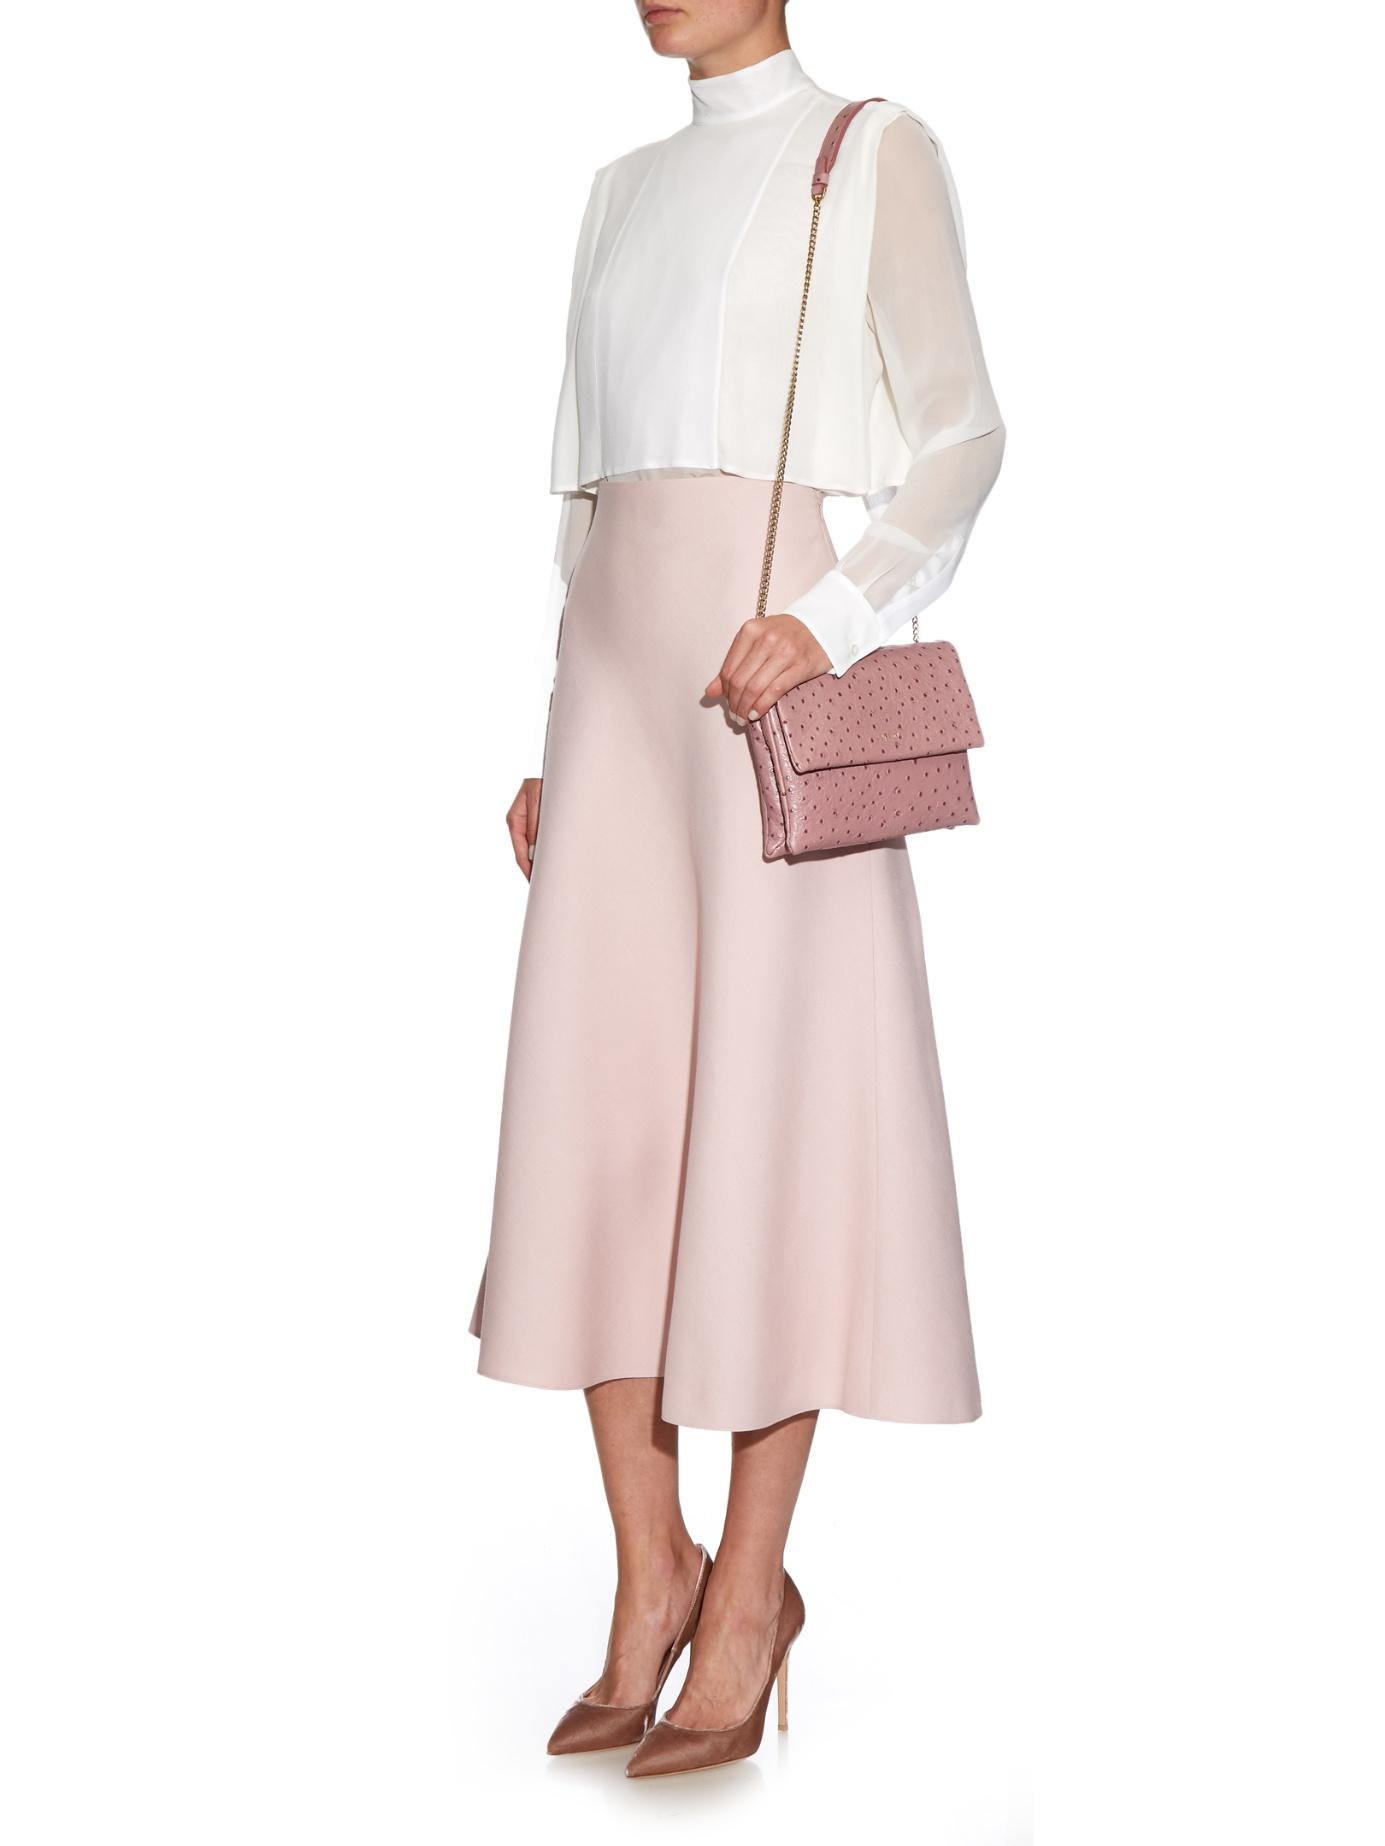 d6cb5315ab53 Lanvin Sugar Mini Ostrich-effect Leather Cross-body Bag in Pink - Lyst